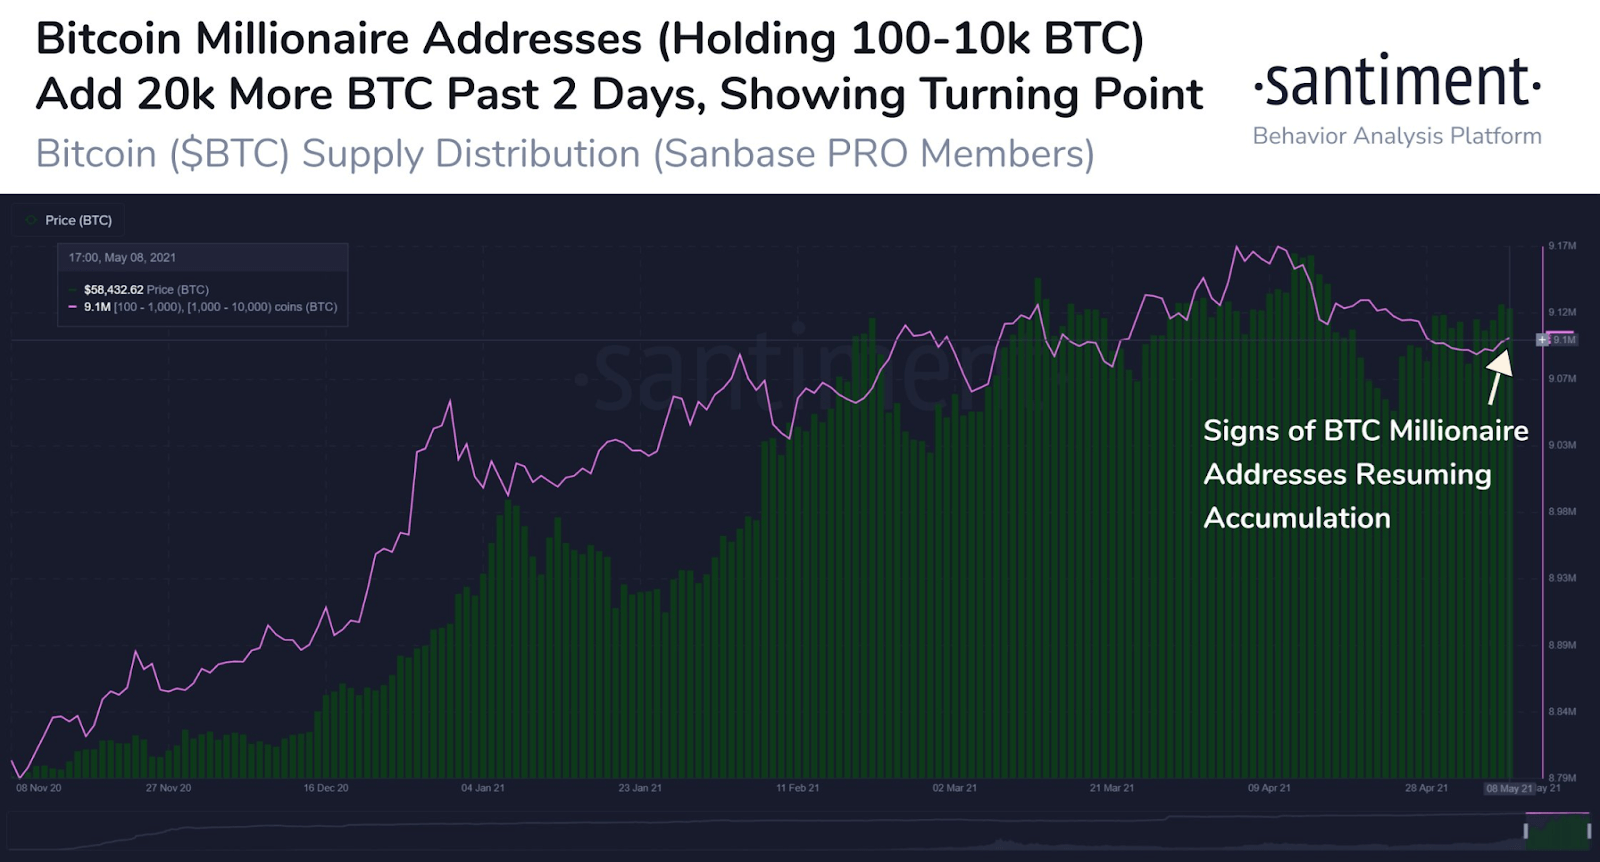 Santiment Chart - Bitcoin Millionaires